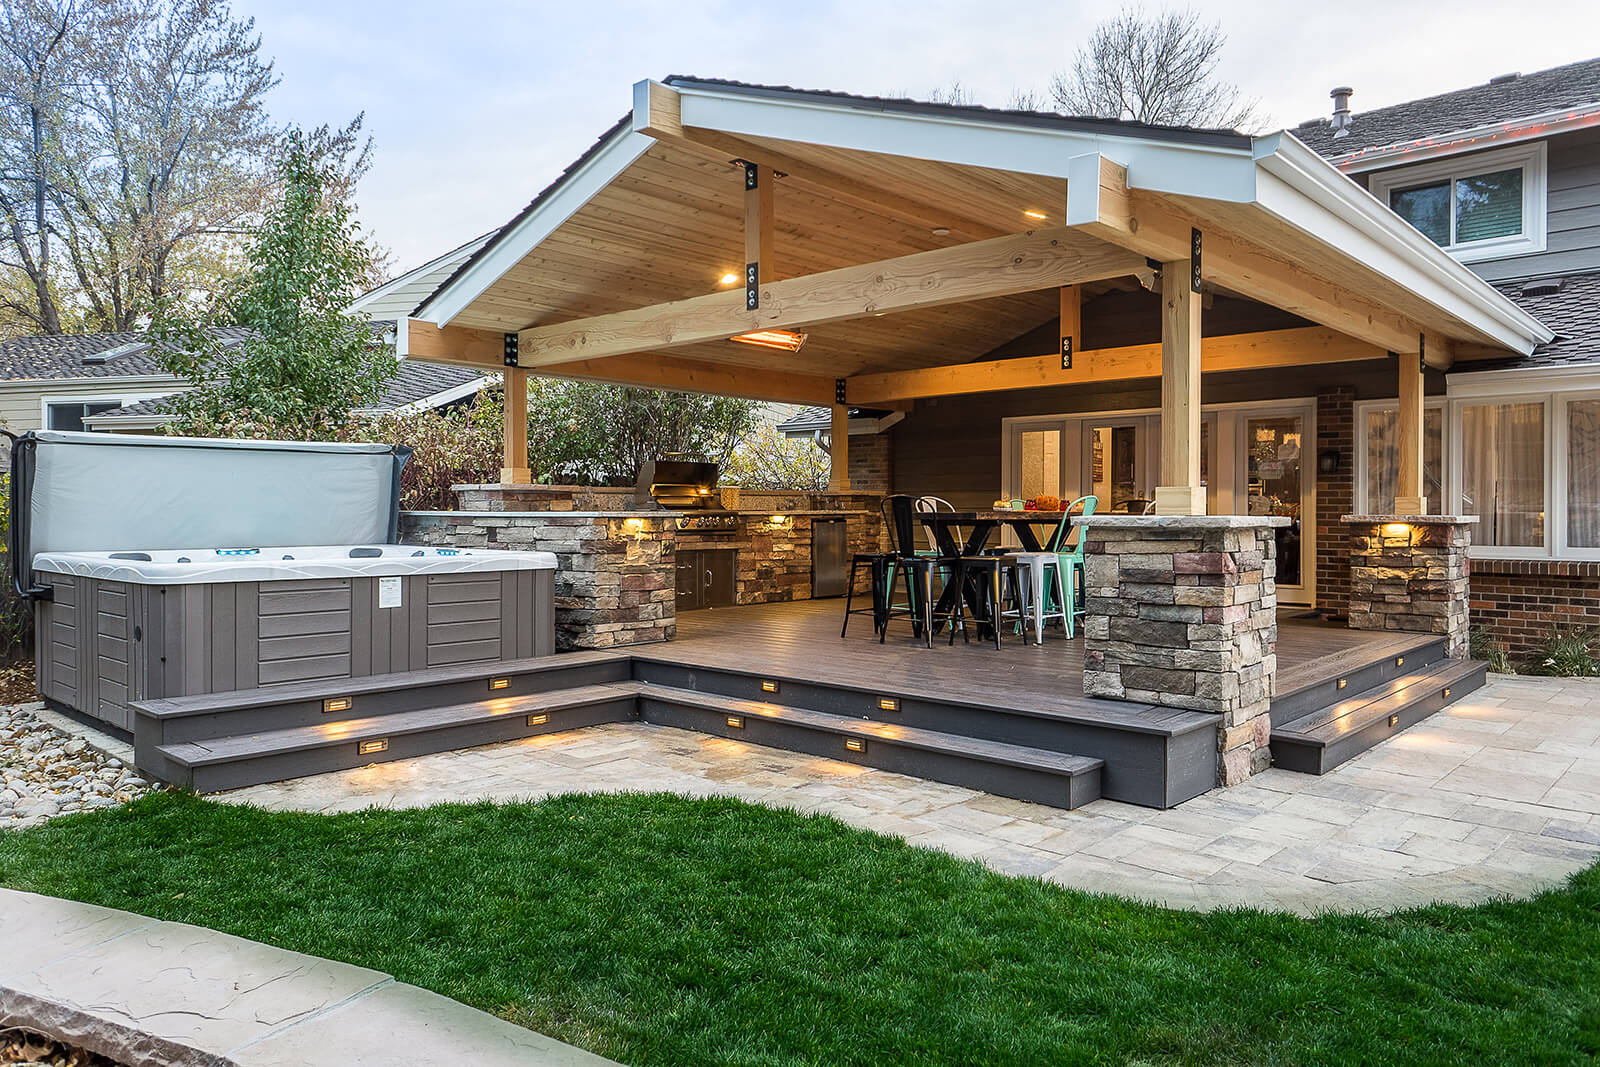 Architectural Landscape Design - Denver Colorado ... on Outdoor Living And Landscapes id=88809